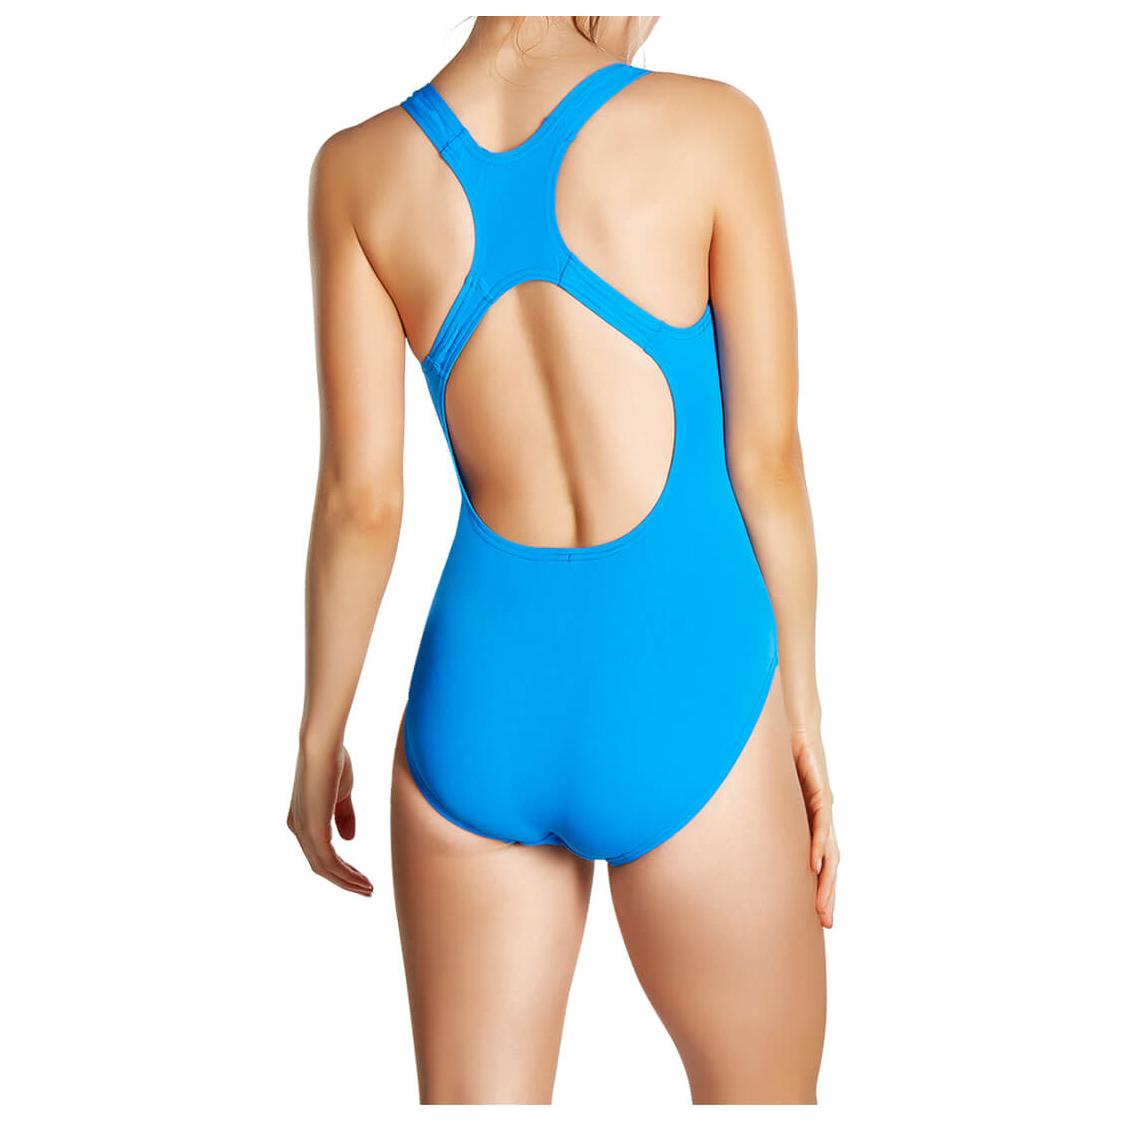 fab264f72010 Speedo - Women's Essential Endurance+ Medalist - Traje de baño - Blue | 30  (EU)